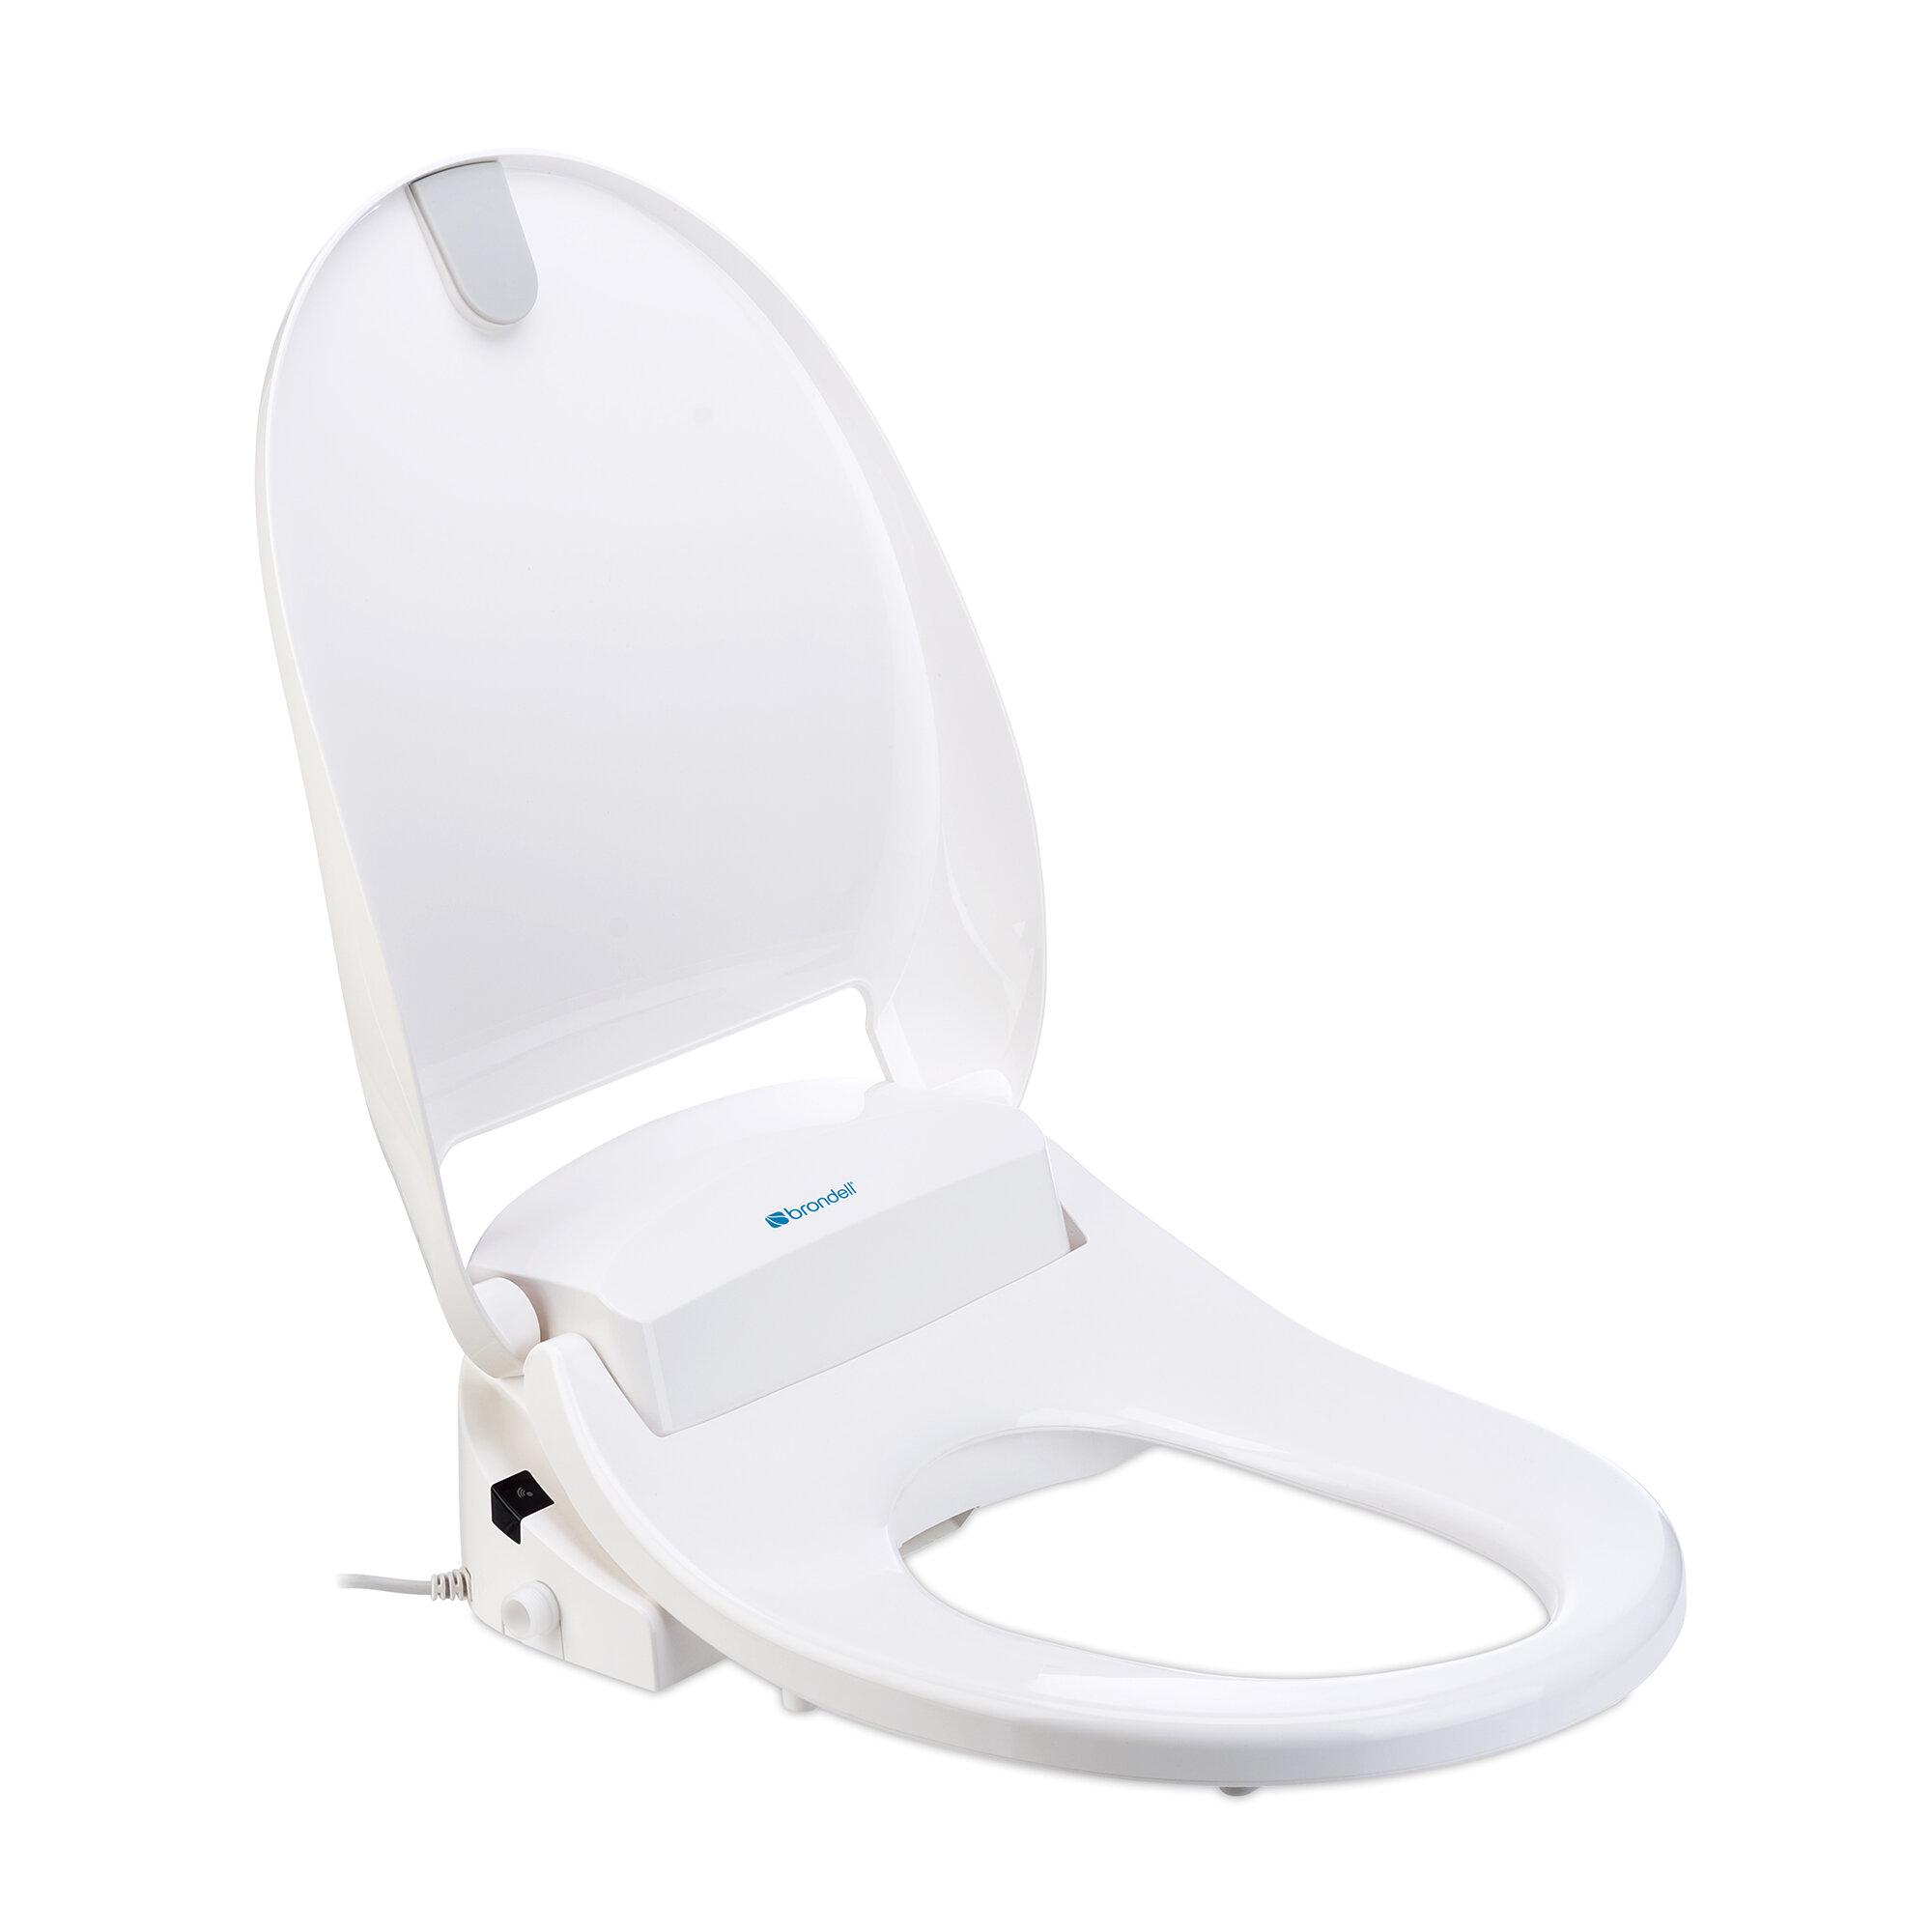 Brondell Swash 300 Round Bidet Toilet Seat Ebay